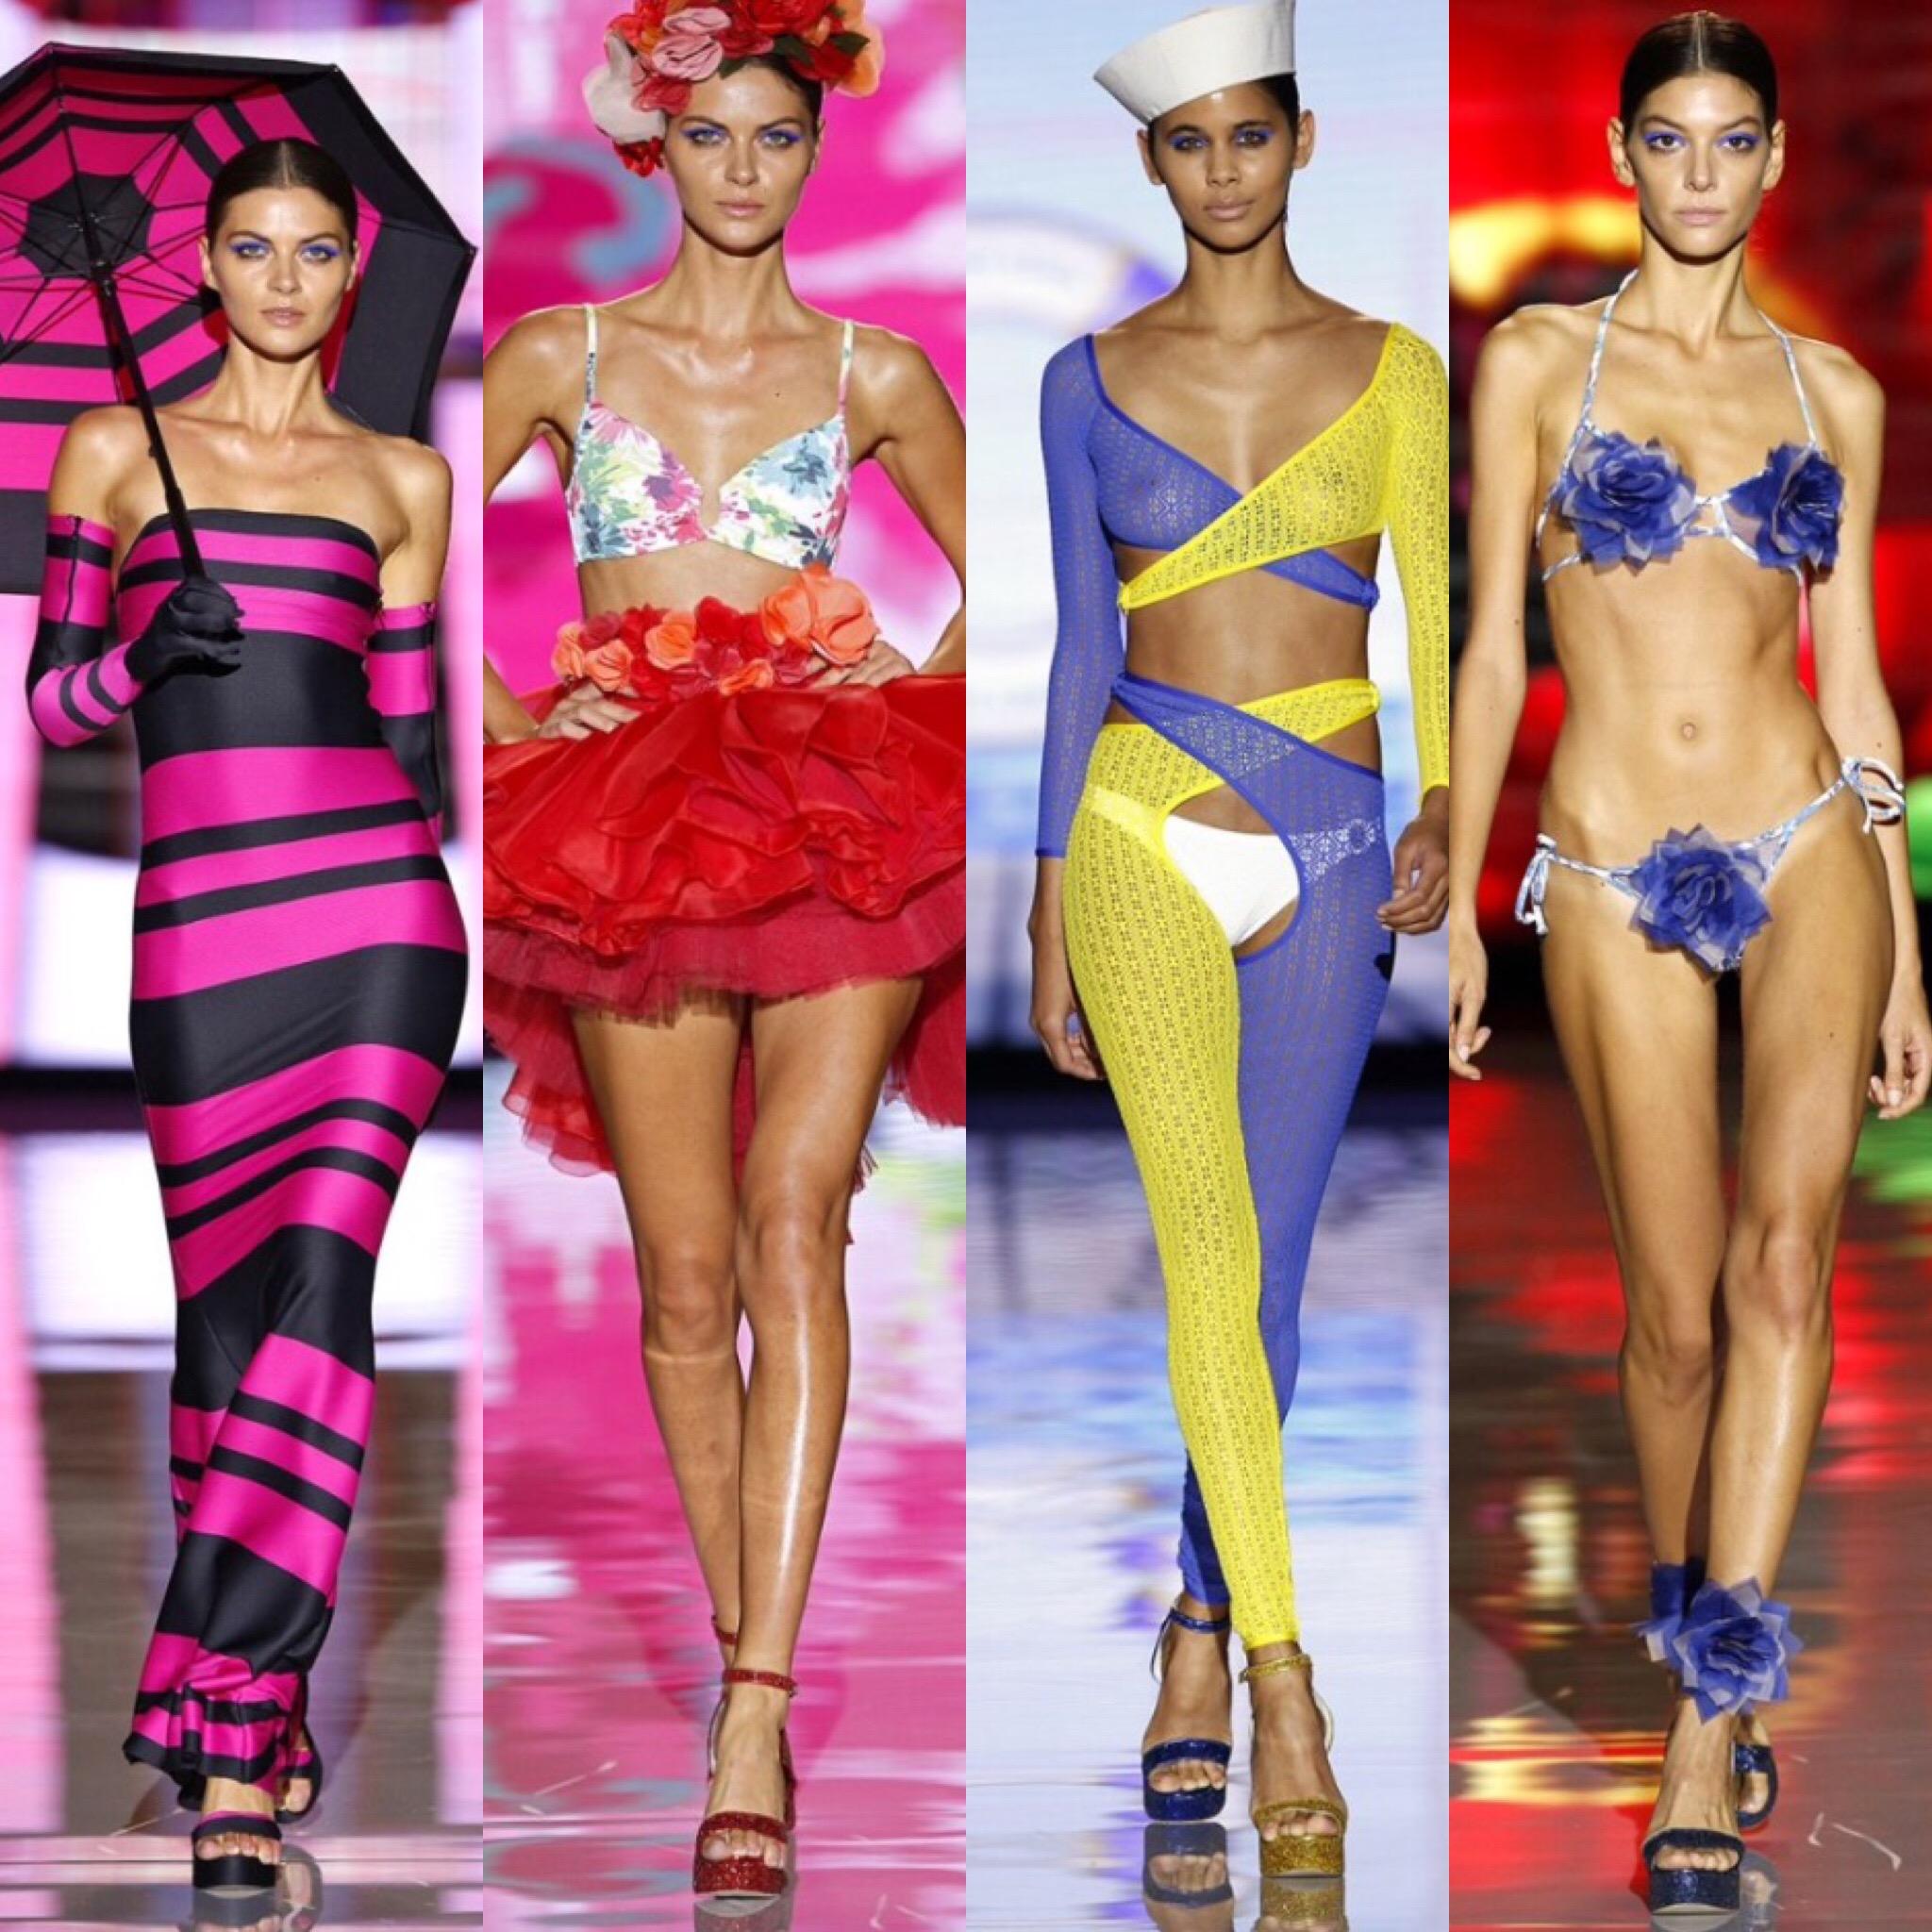 Madeincandela blogger moda turismo